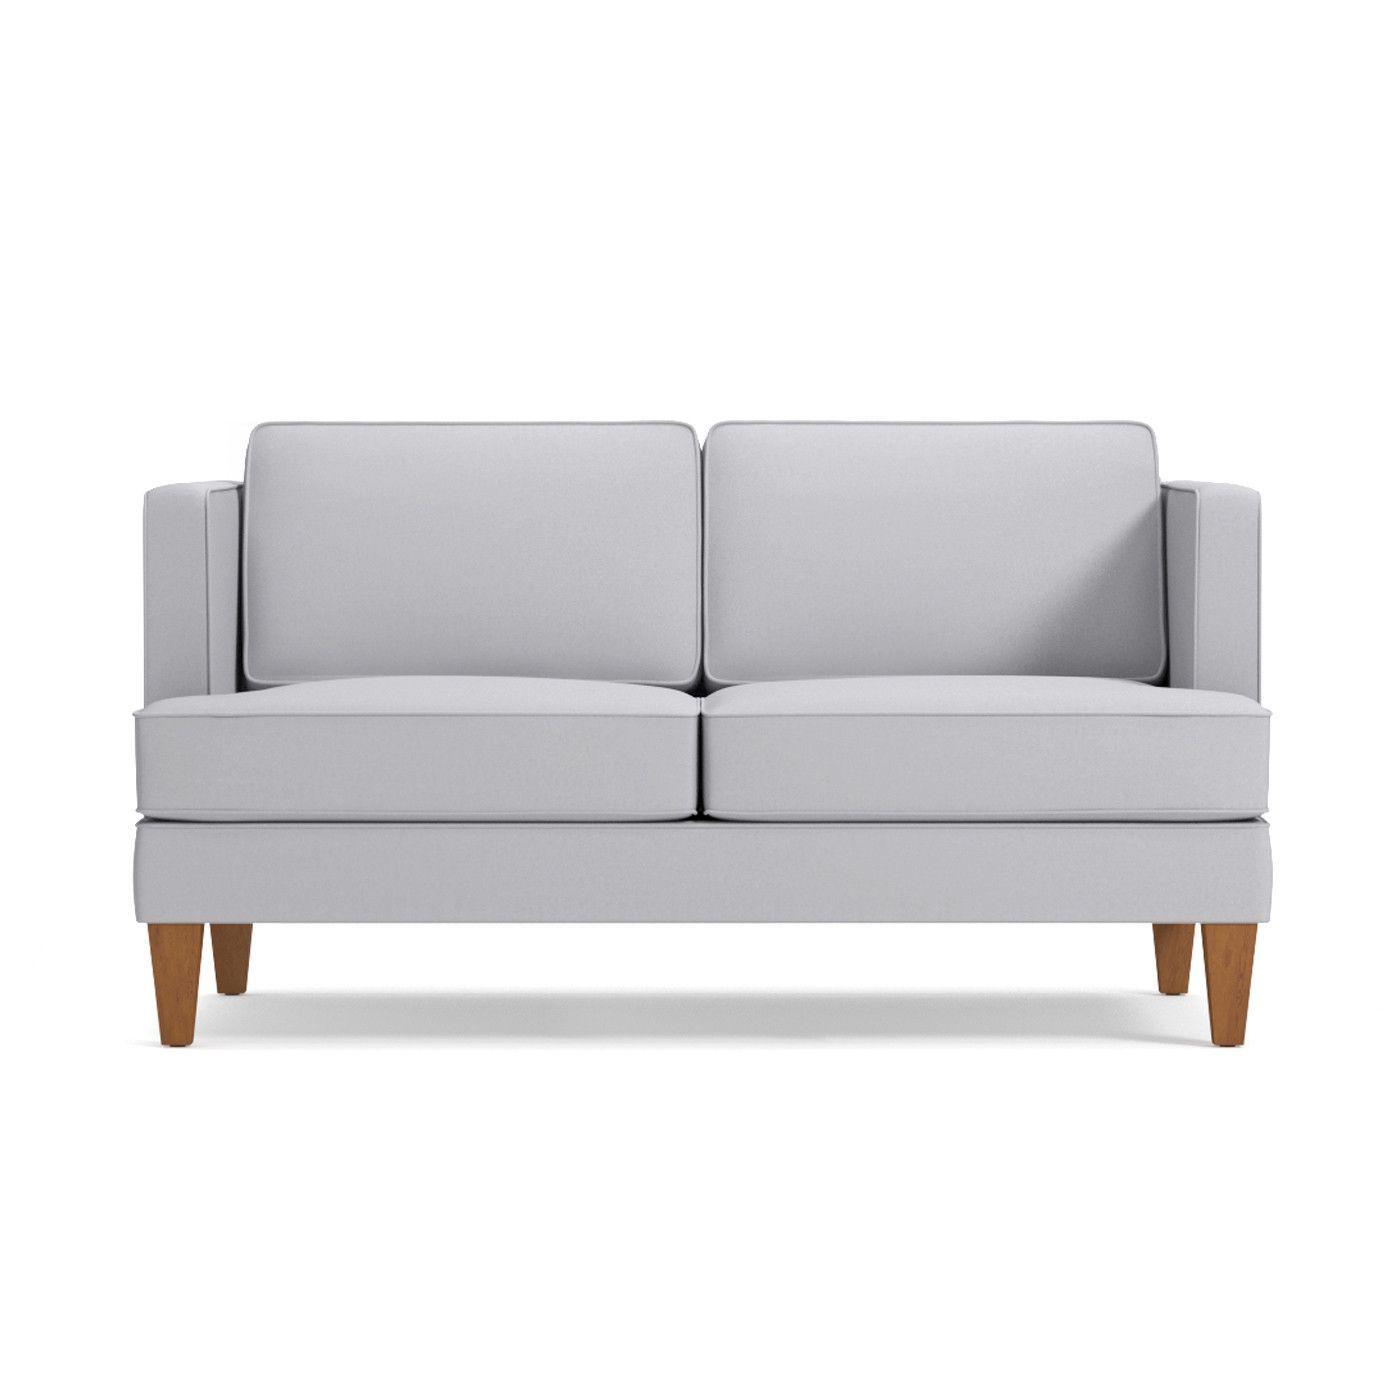 Astor Apartment Size Sofa from Kyle Schuneman CHOICE OF FABRICS